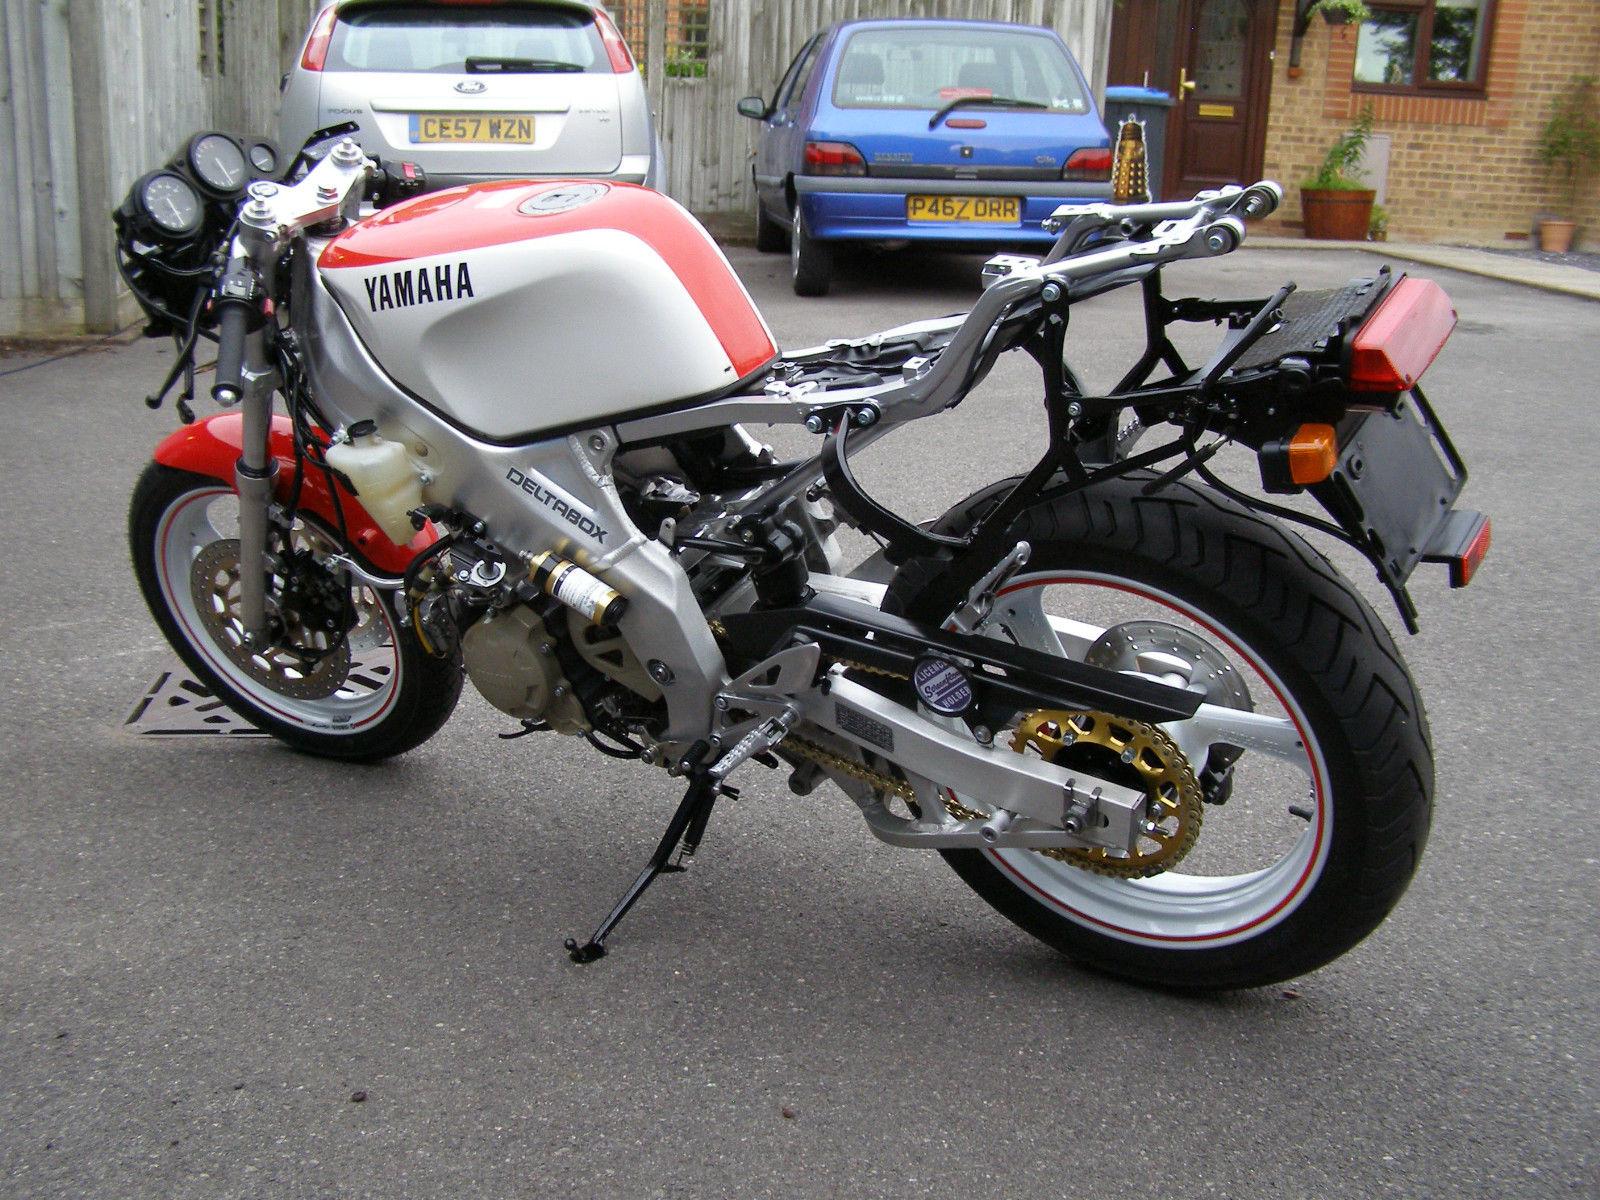 Yamaha Tzr 250 3ma Reverse Cylinder Fully Restored Bike